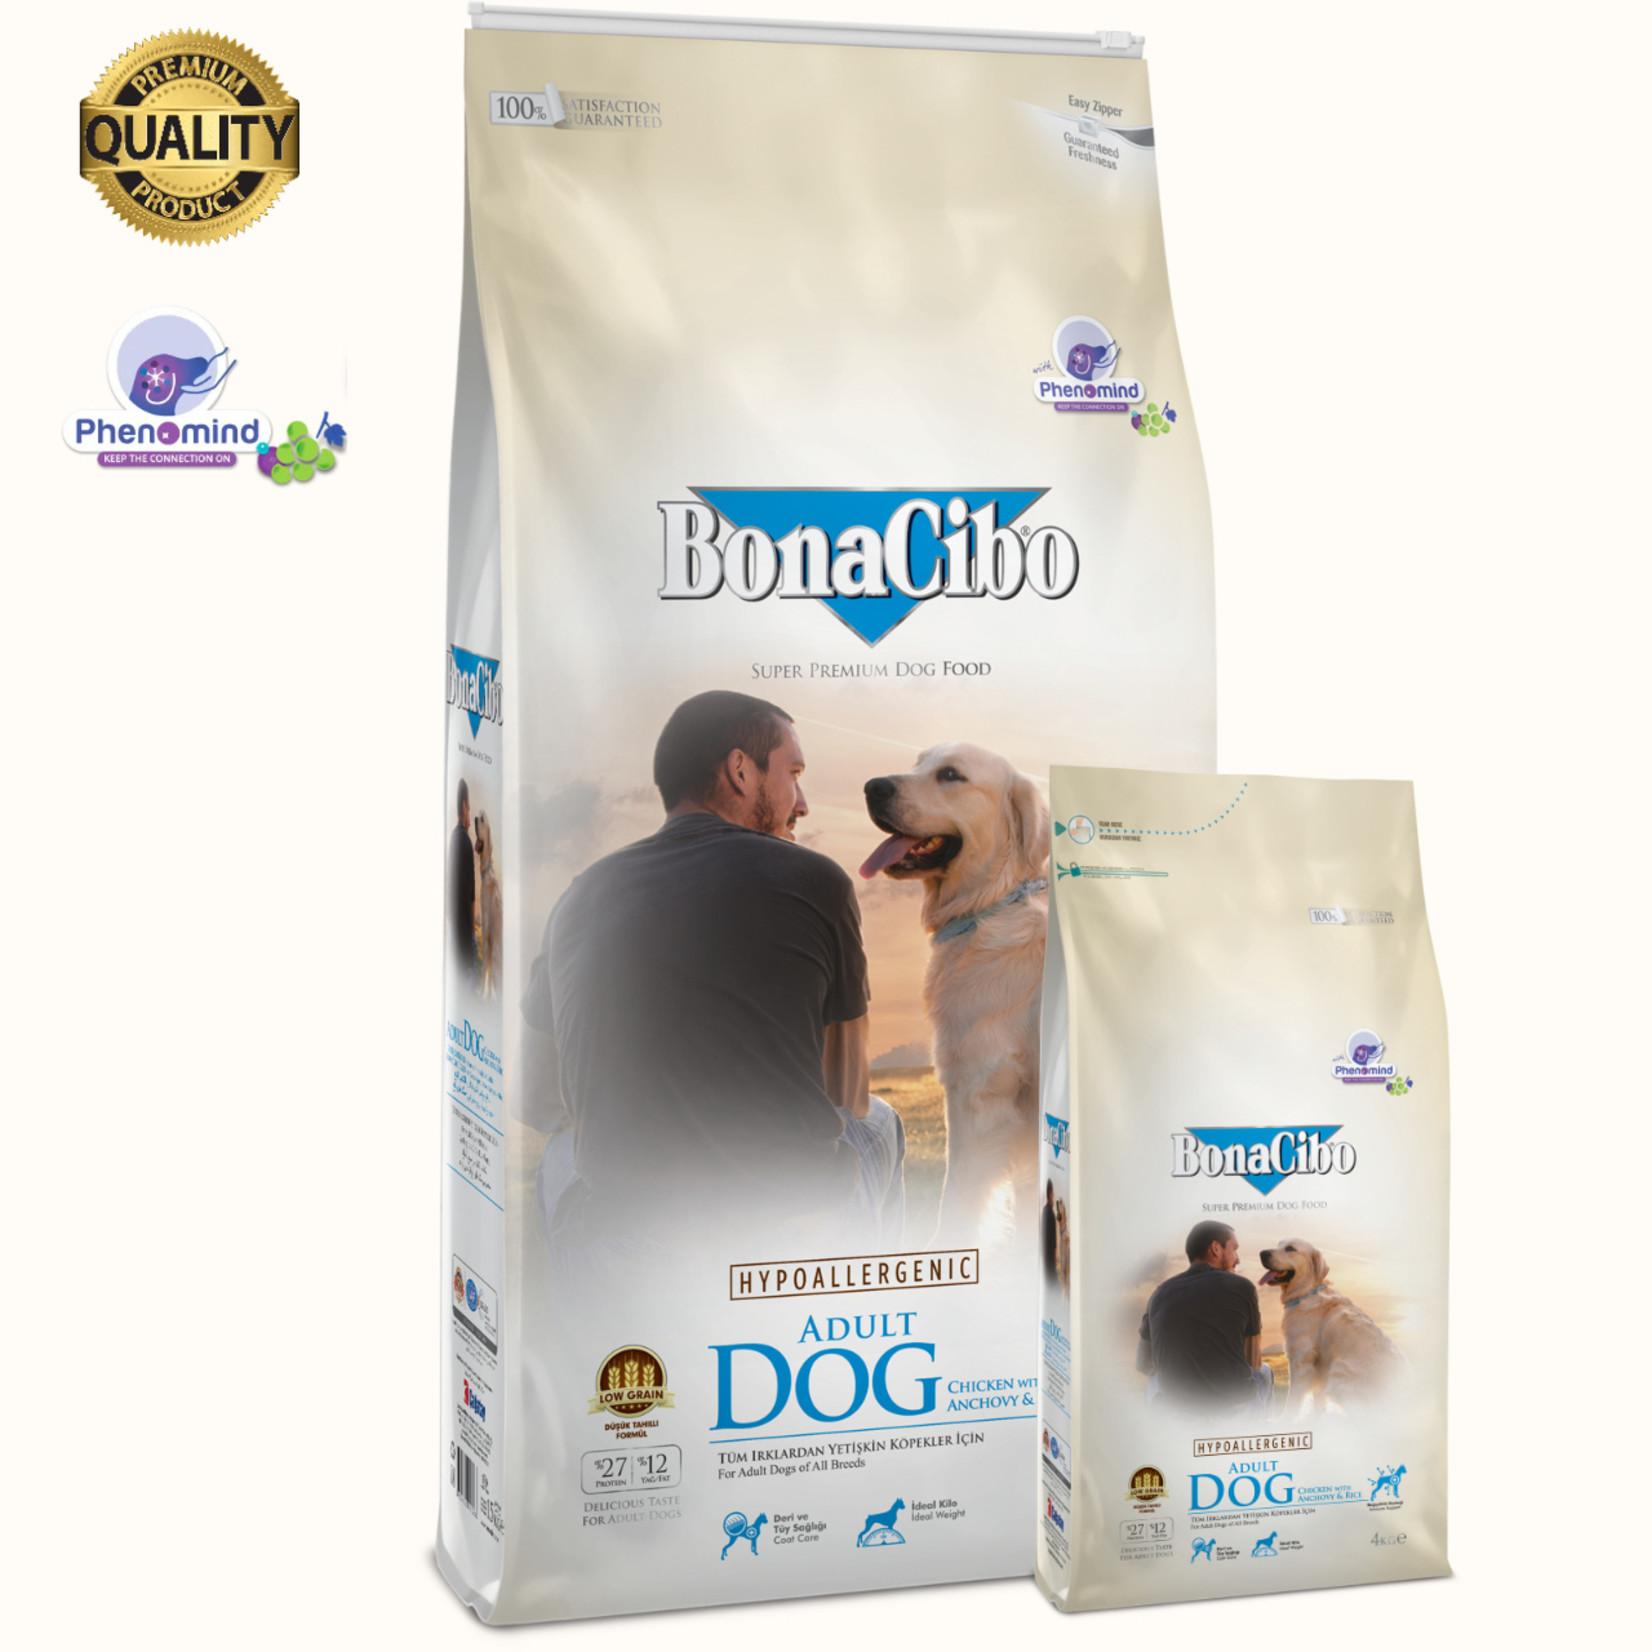 Bonacibo Bonacibo Dog Kip & Rijst met Ansjovis | Hypoallergeen Premium Hondenvoer